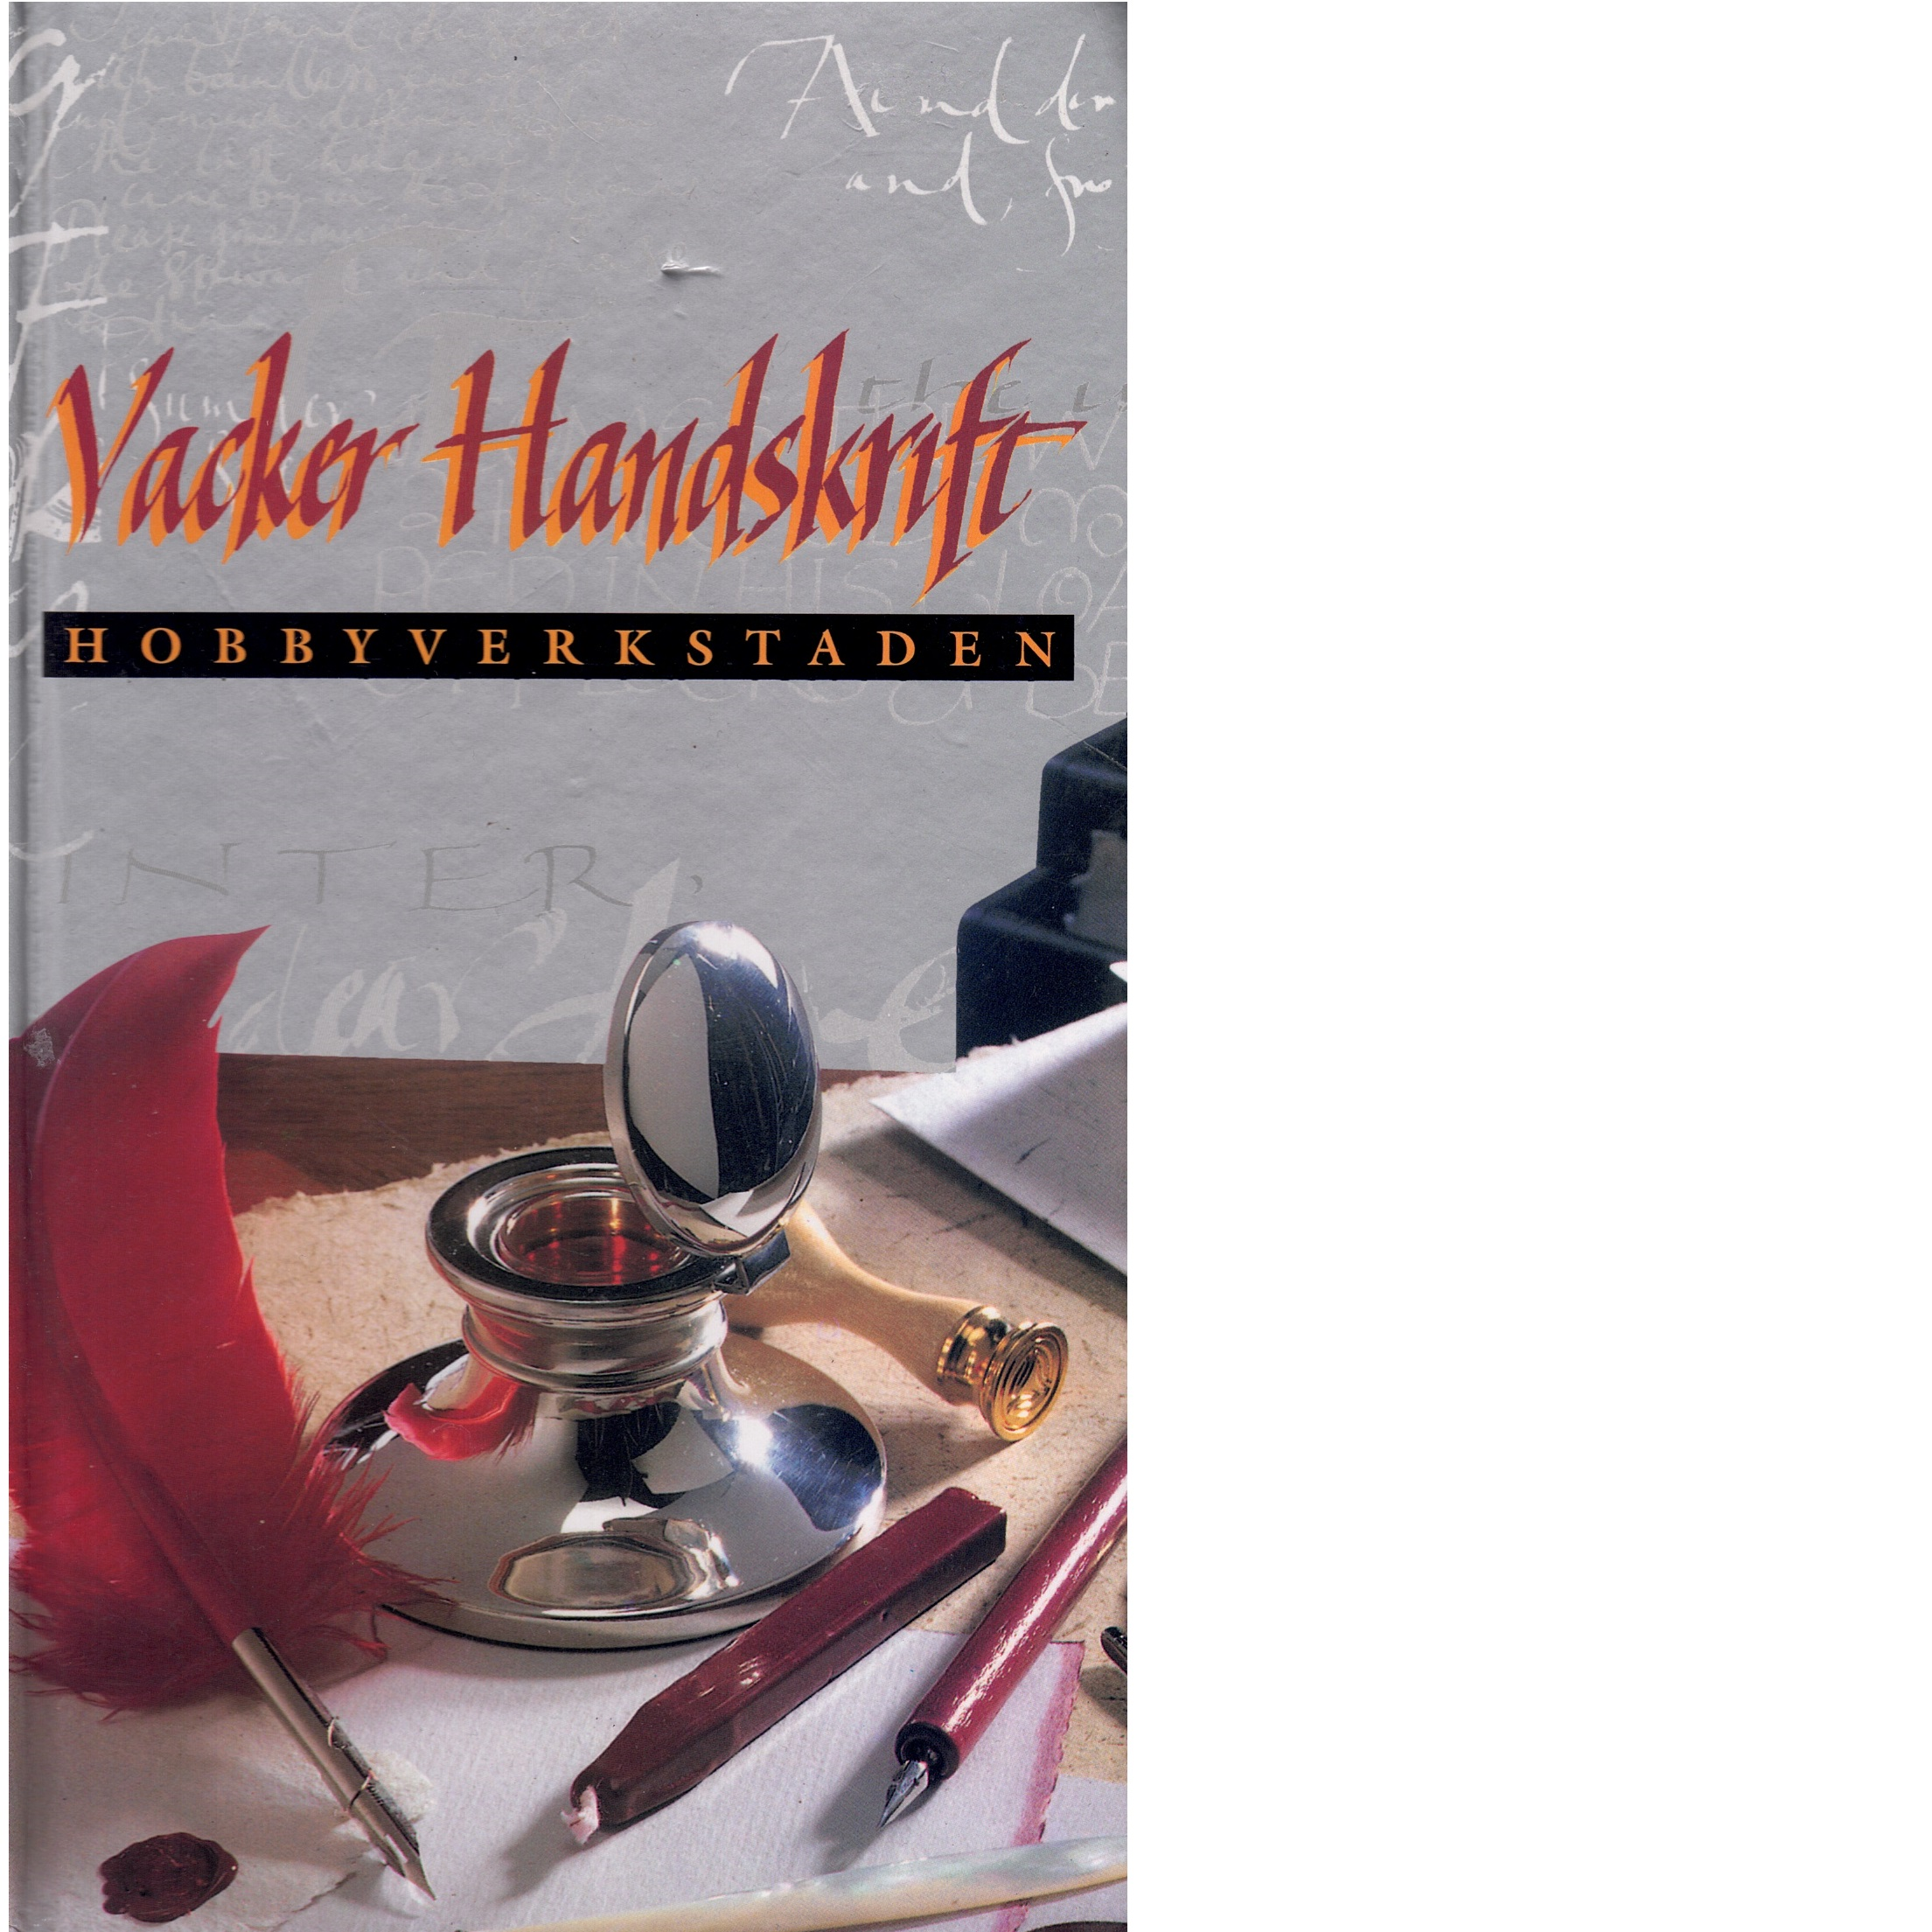 Vacker handskrift: hobbyverkstaden - Secrett, Claiare